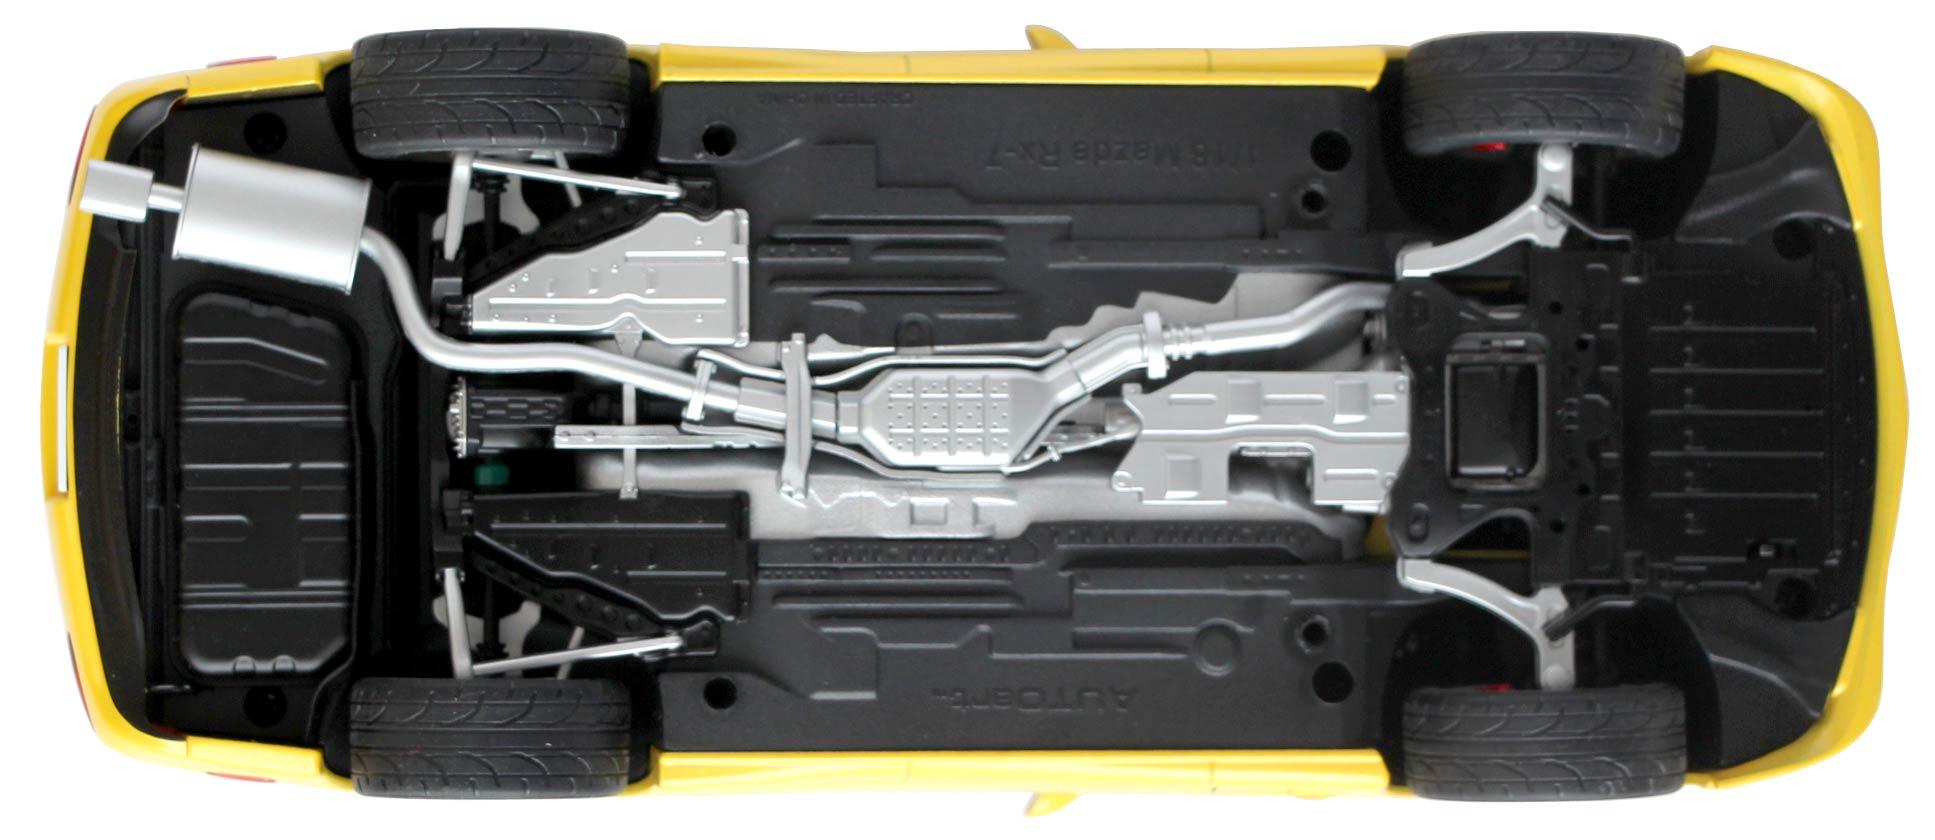 Vue de dessous de la Mazda RX 7 Initial D AUTOart ech 1/18